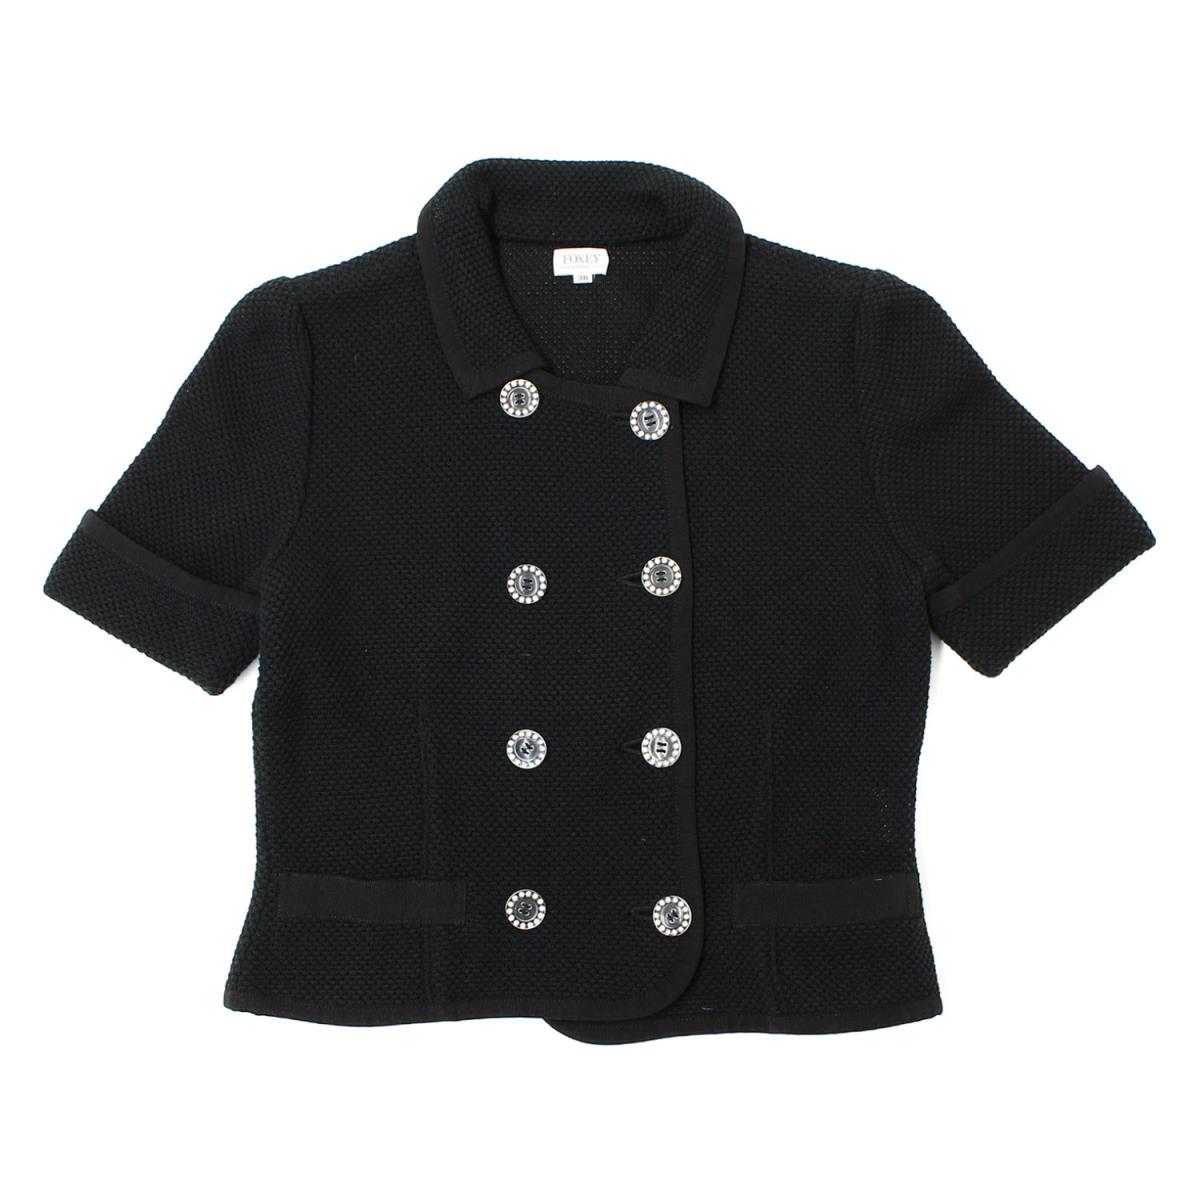 FOXEY(フォクシー) メッシュ襟付き半袖ニットジャケット スカート セットアップ フォーマル ブラック 38 【レディース】【美品】【K2073】【中古】